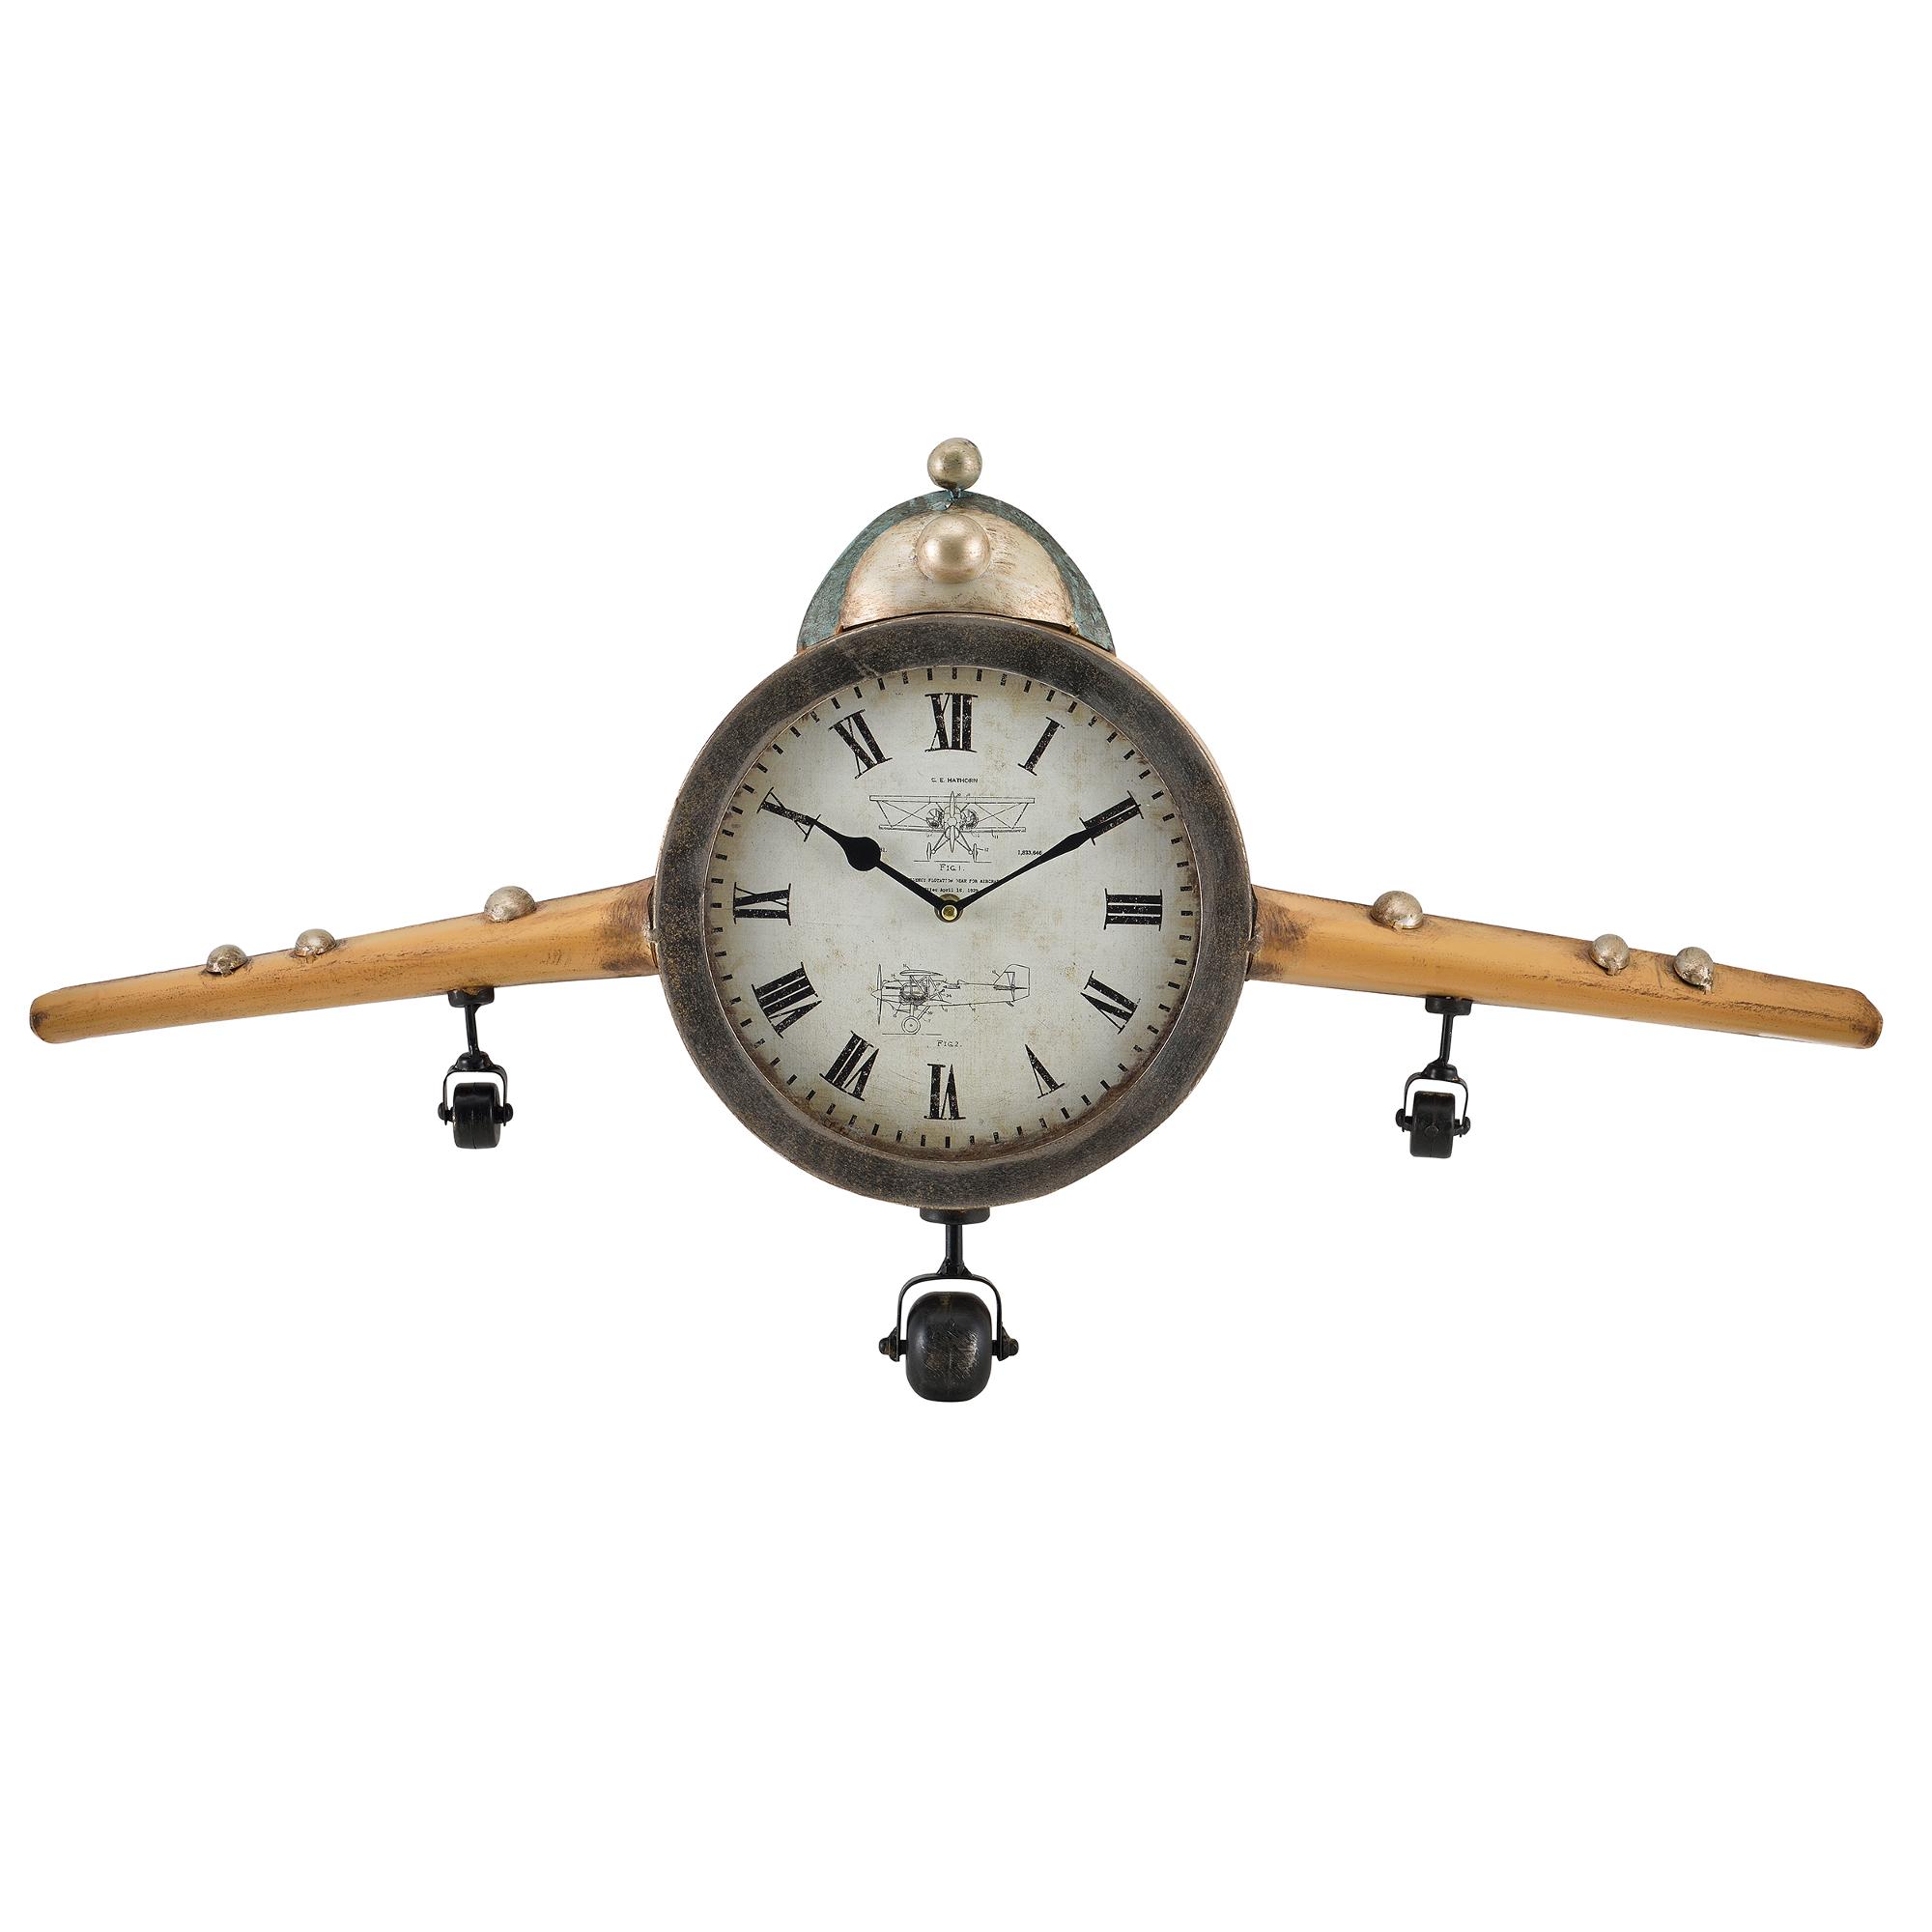 horloge murale avion frontal m tal d co montre. Black Bedroom Furniture Sets. Home Design Ideas